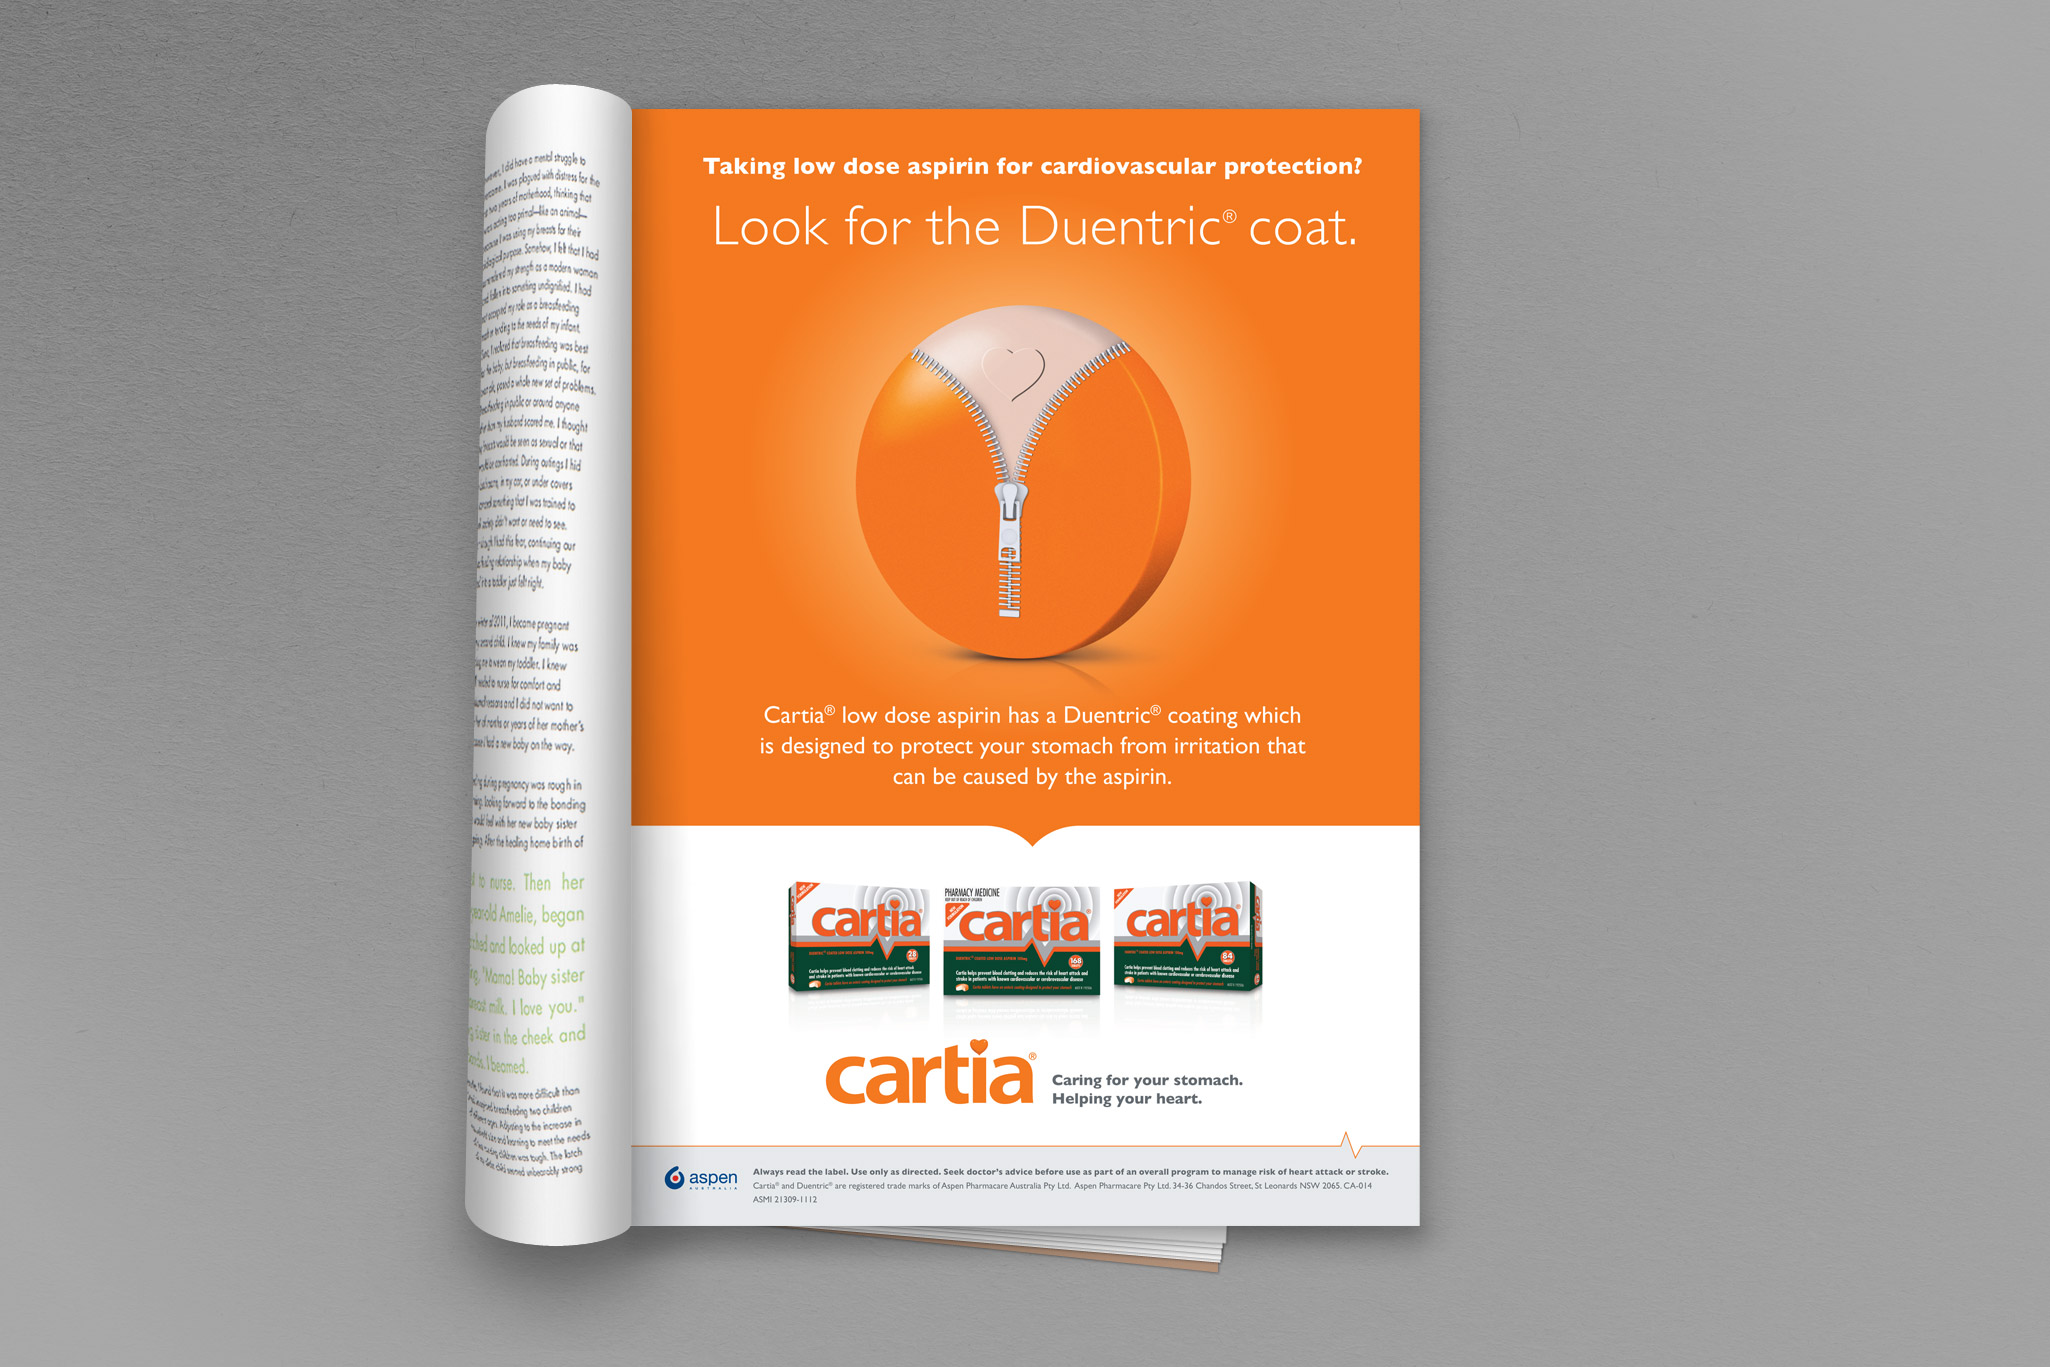 Aspen_Cartia_Magazine_advertising_design_1.jpg